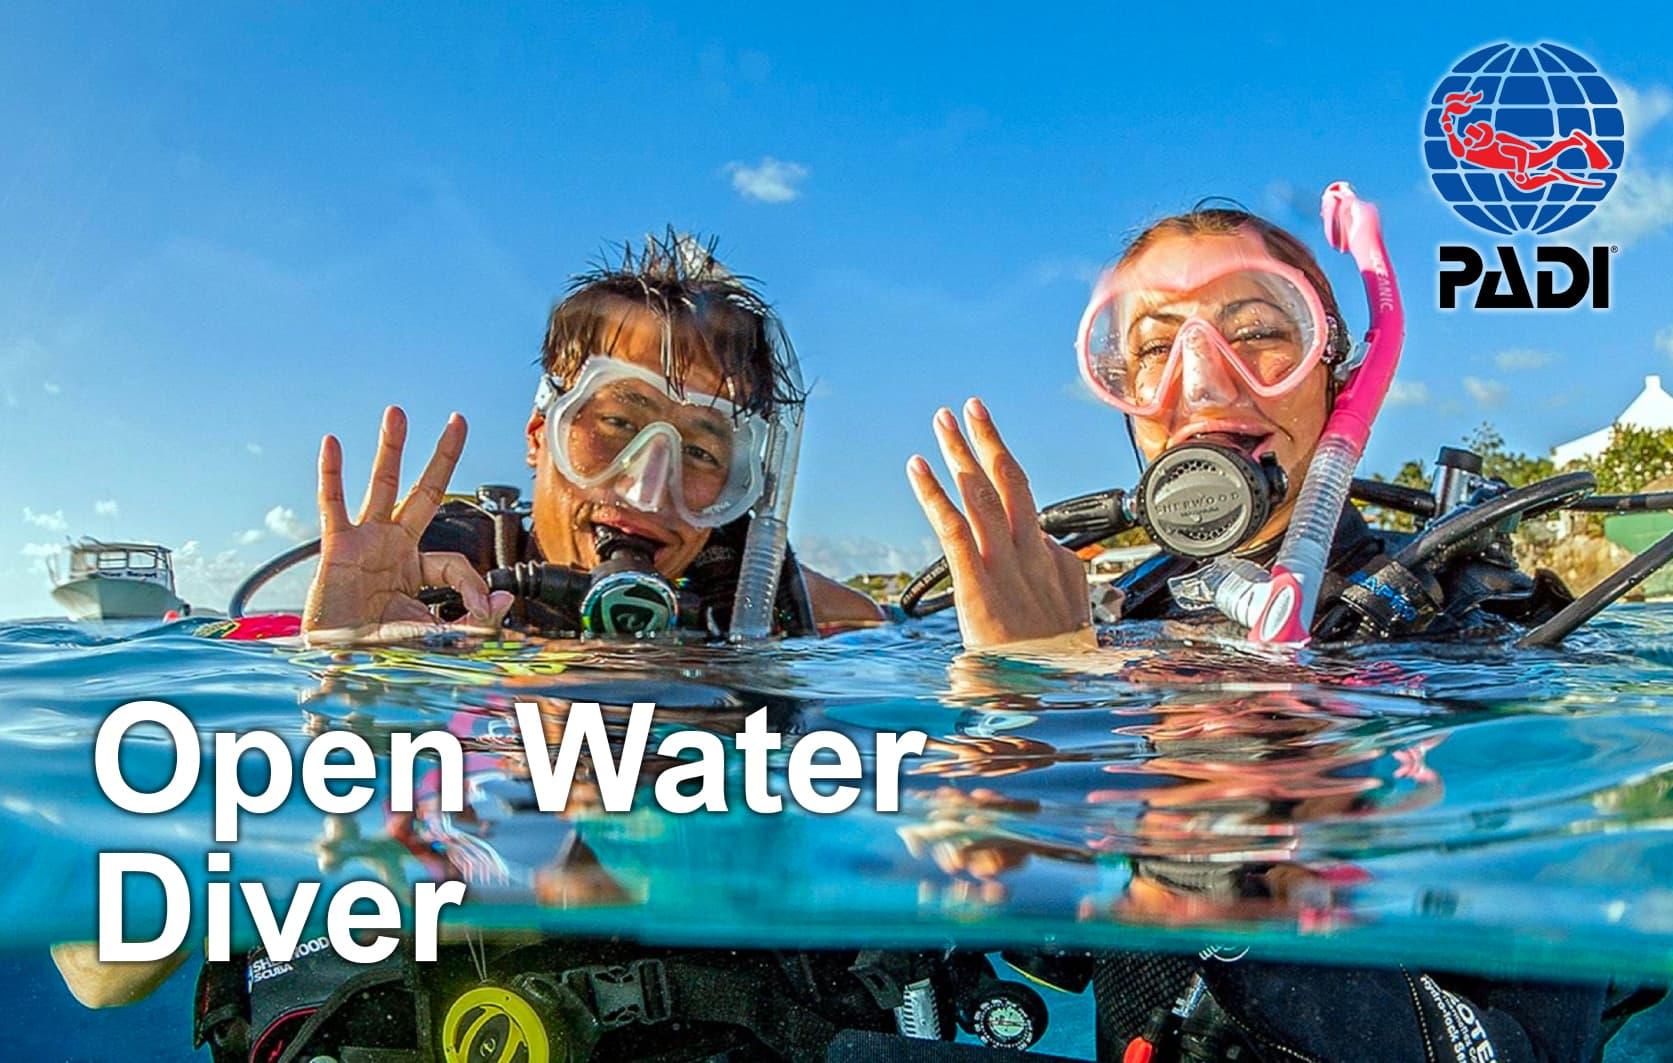 PADI Open Water Diver (OWD) - 09.07.-18.07.2021